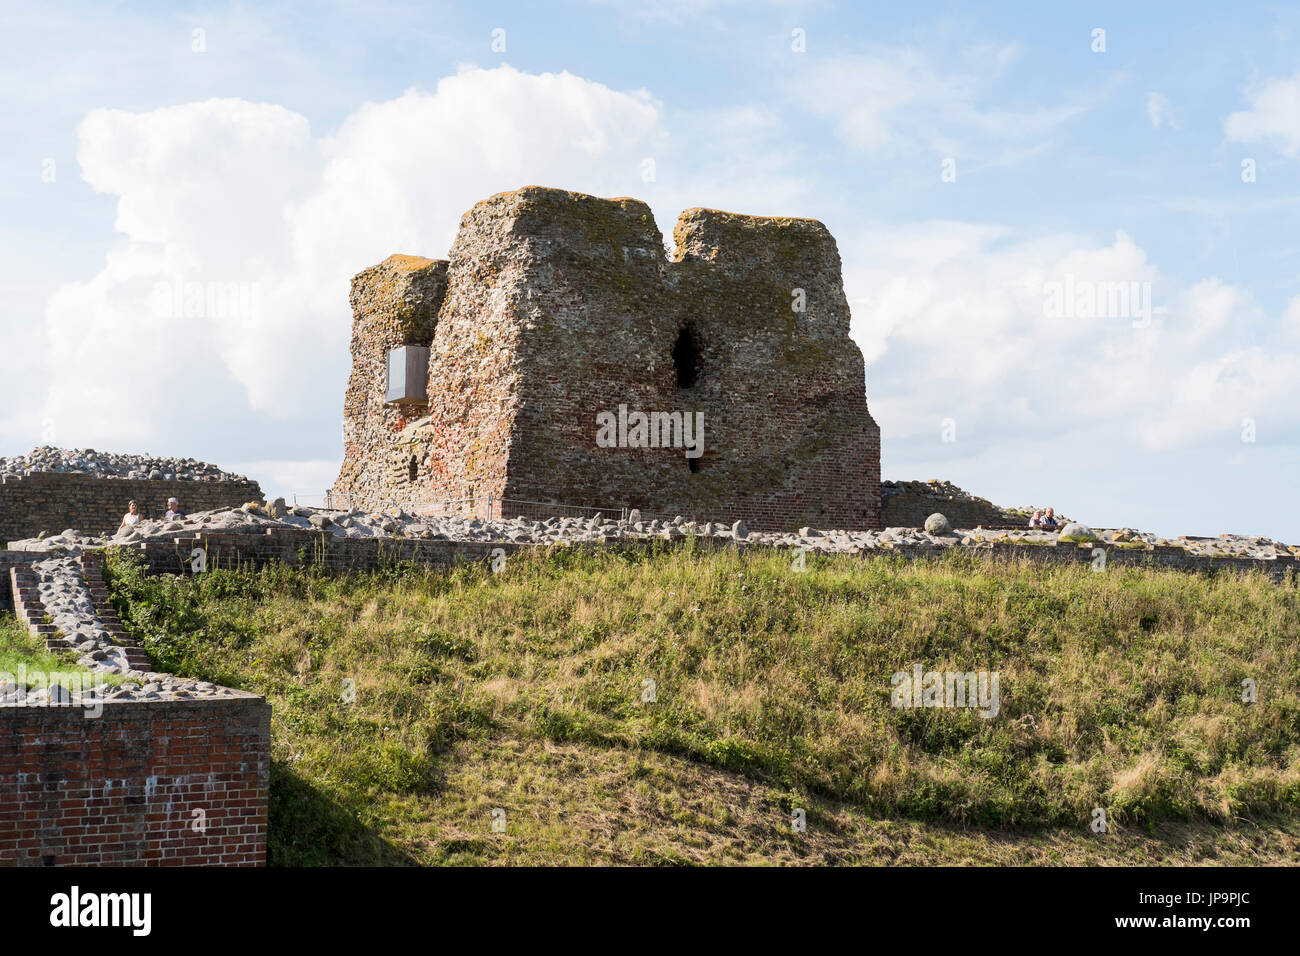 Kalø castle - Kalø slot ruins near Aarhus - Jutland - Denmark Stock Photo: 151420708 - Alamy